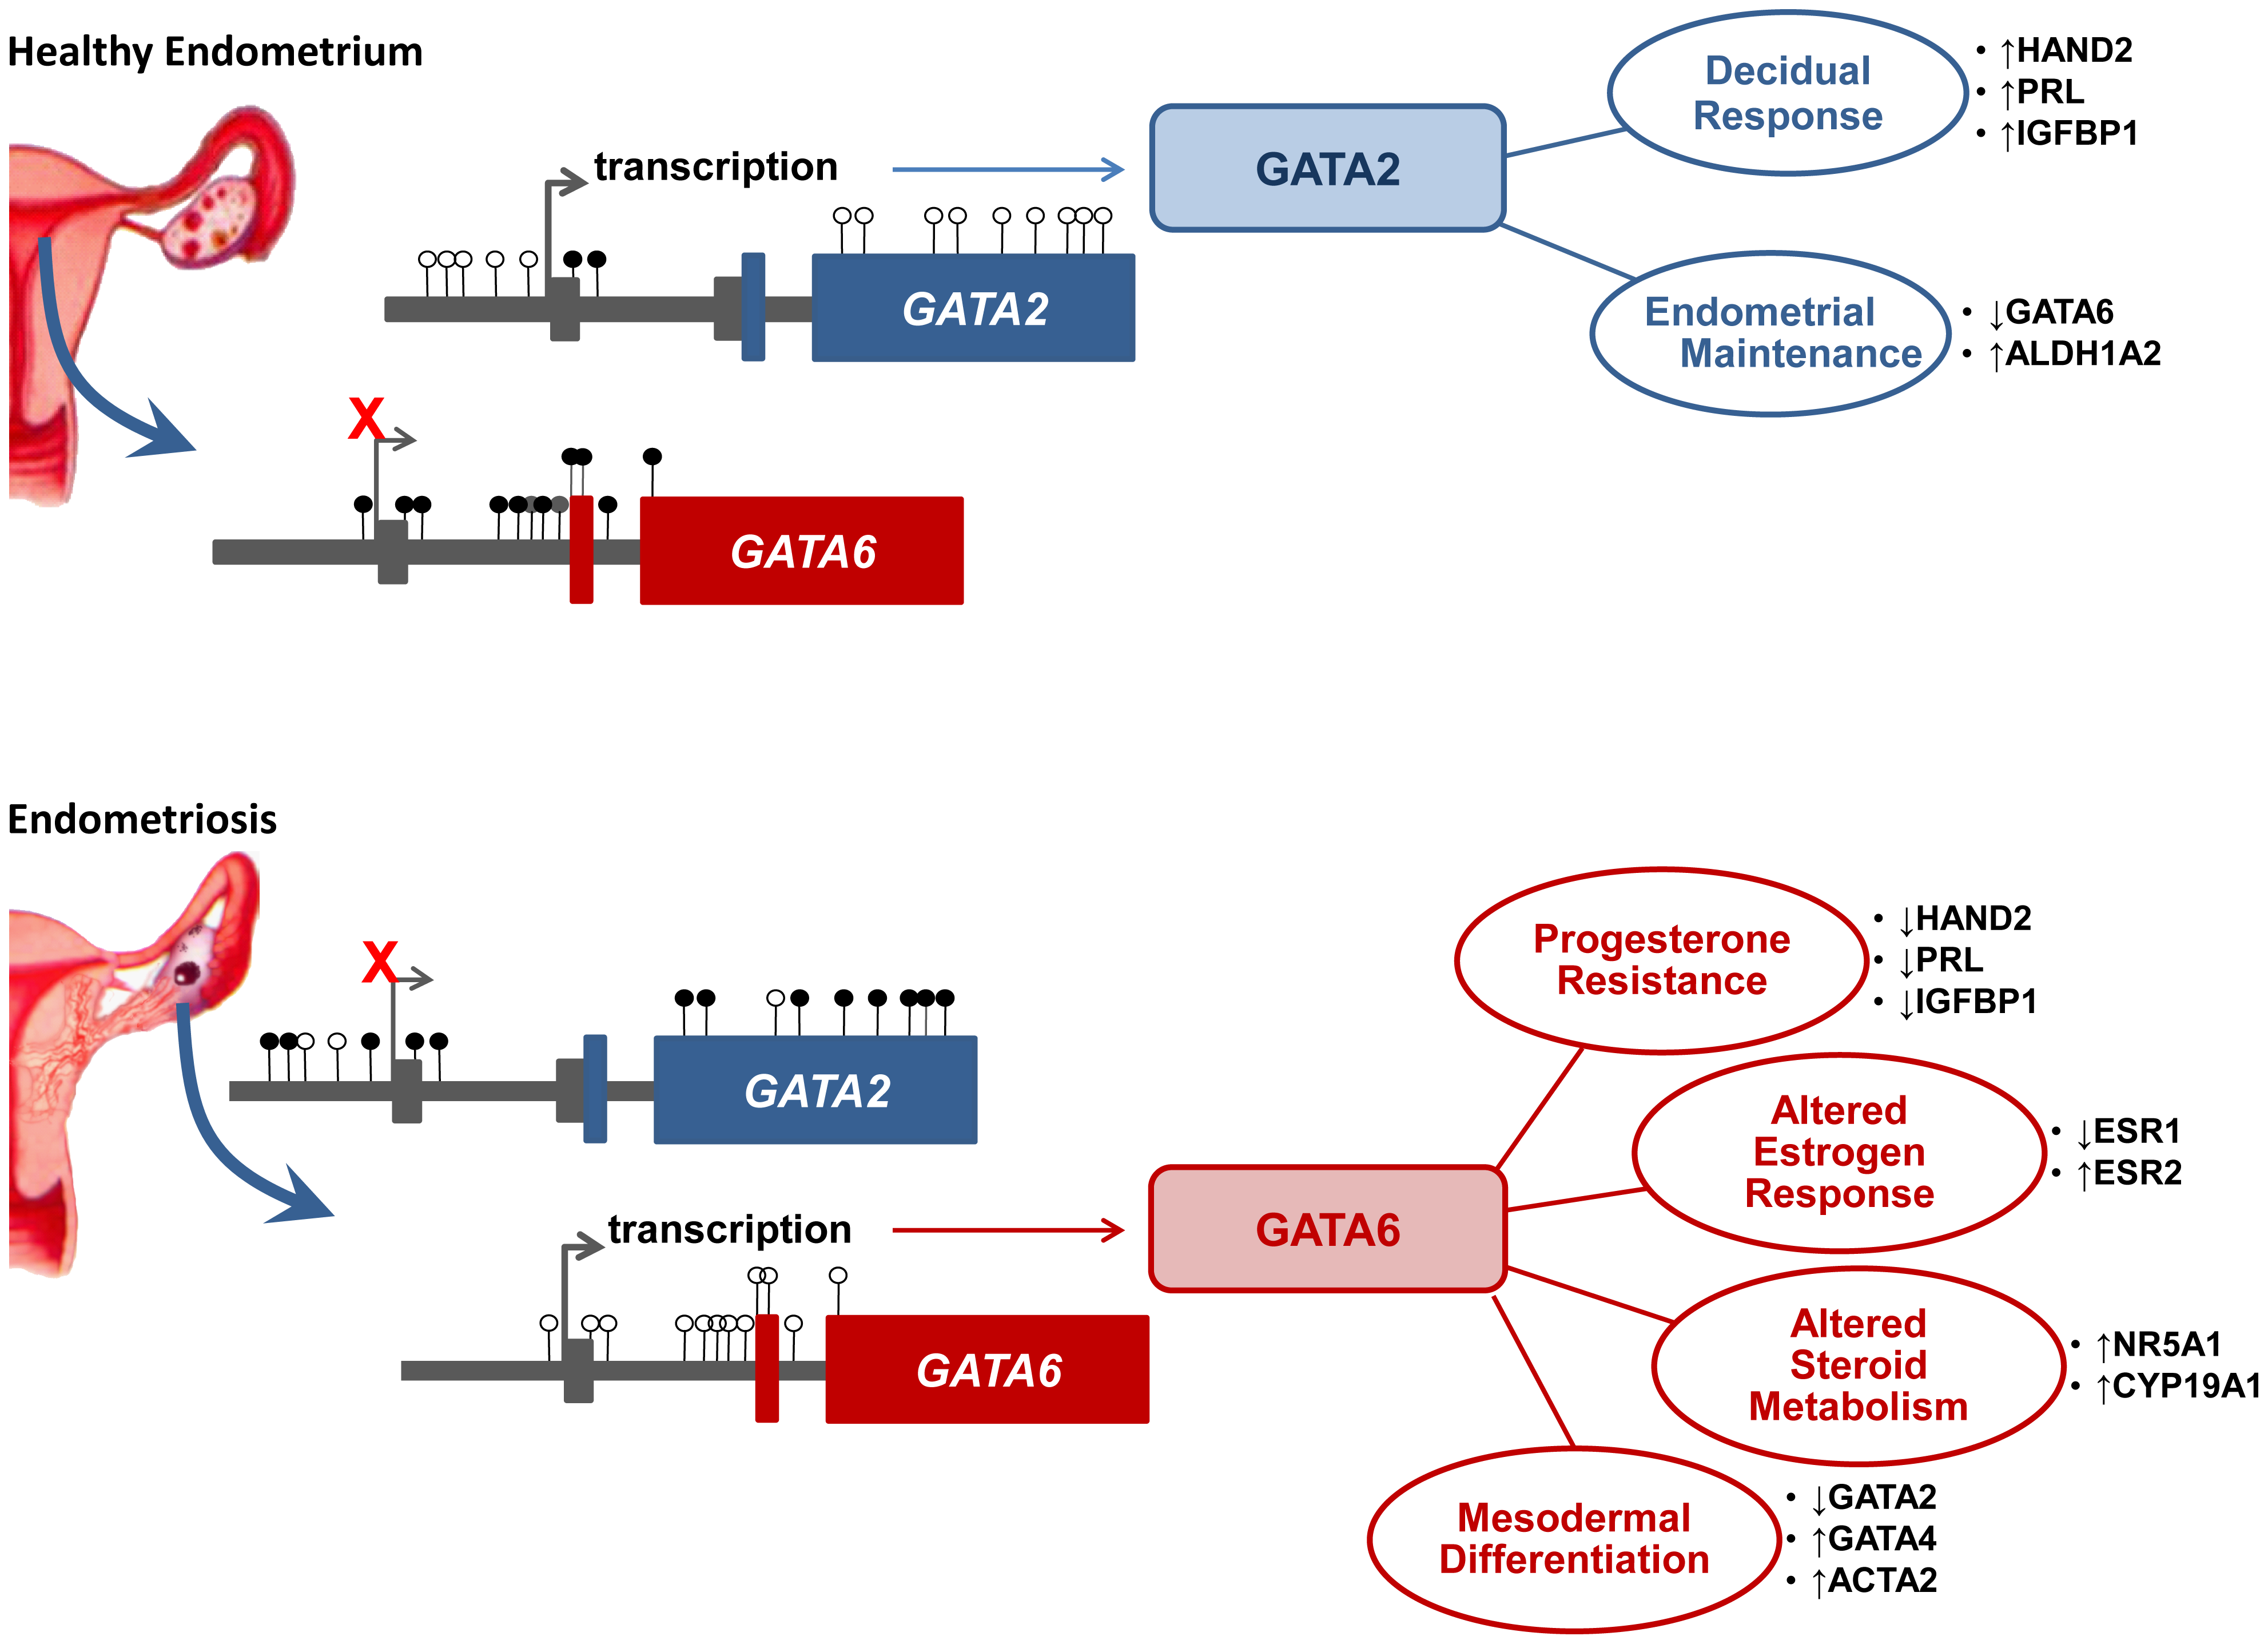 A putative epigenetic switch in endometriosis.